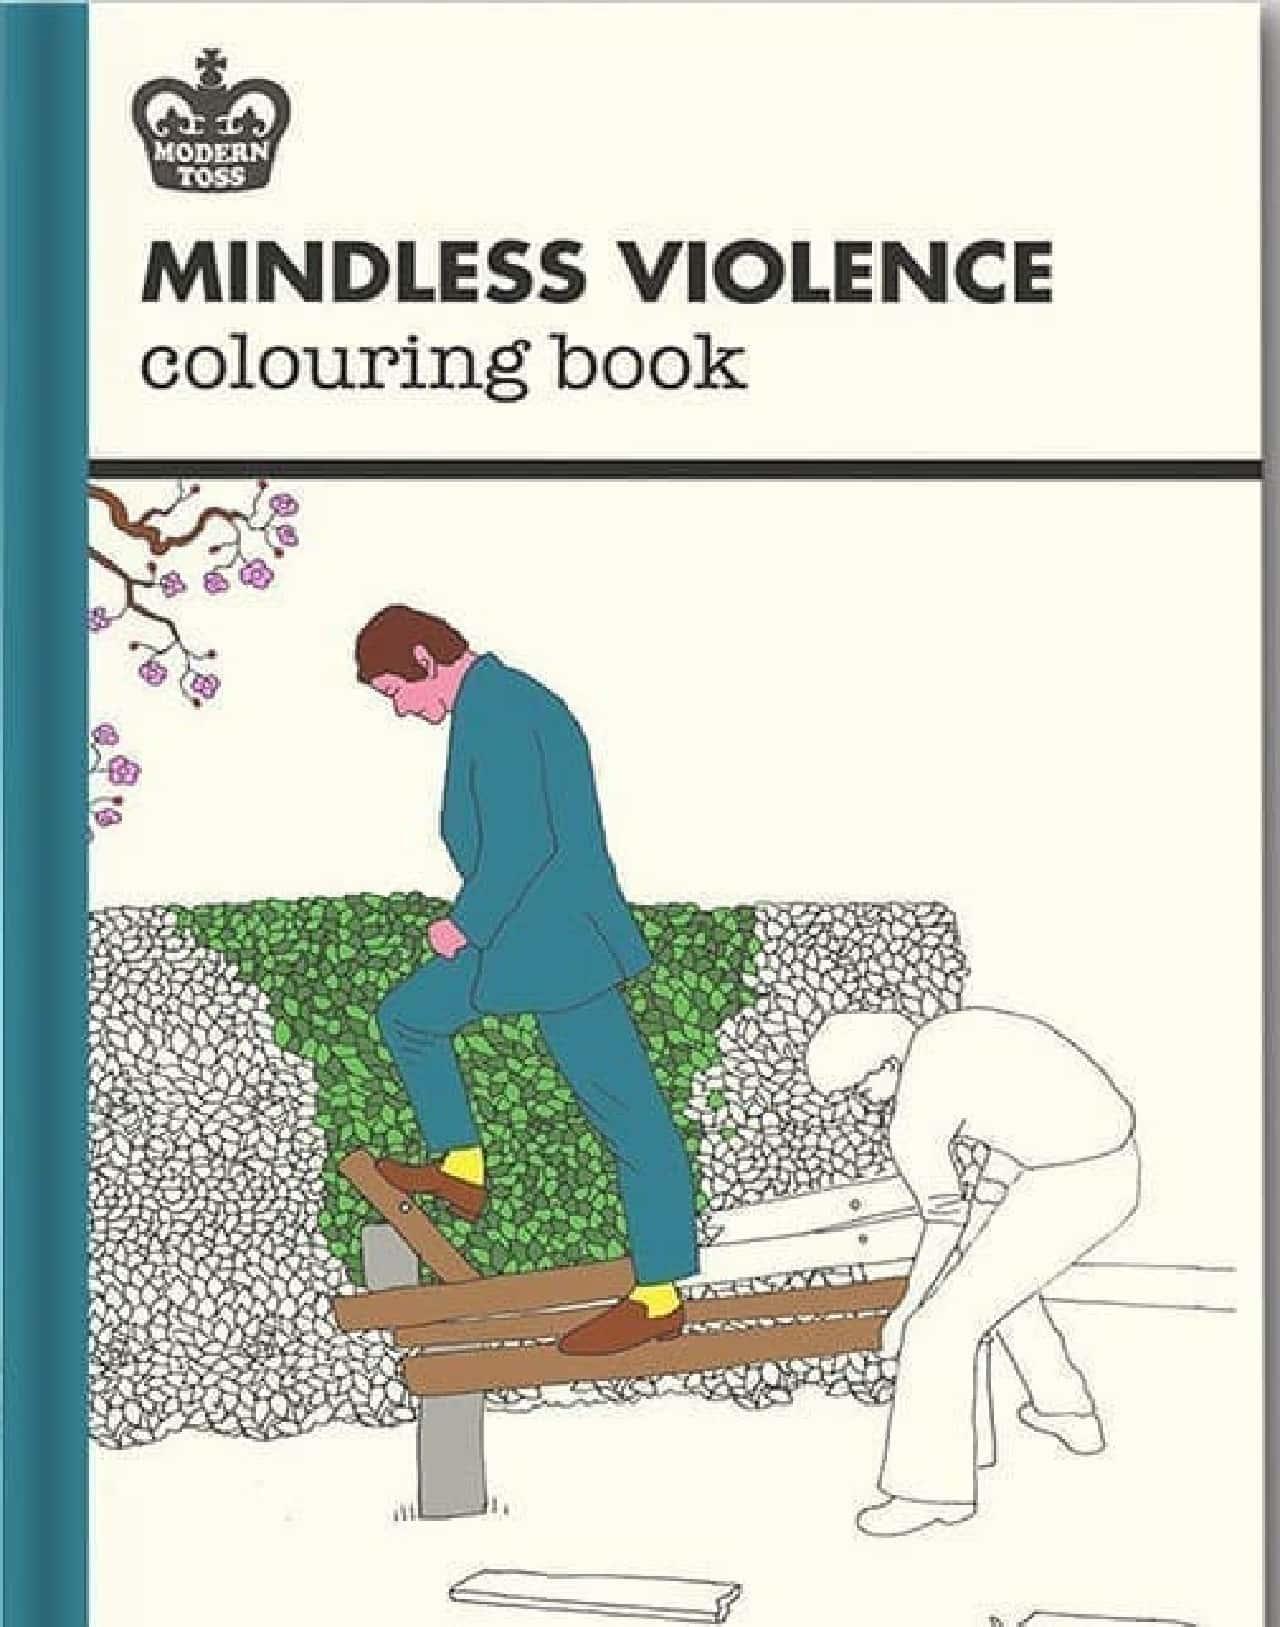 「Mindless violence」のヒトコマ